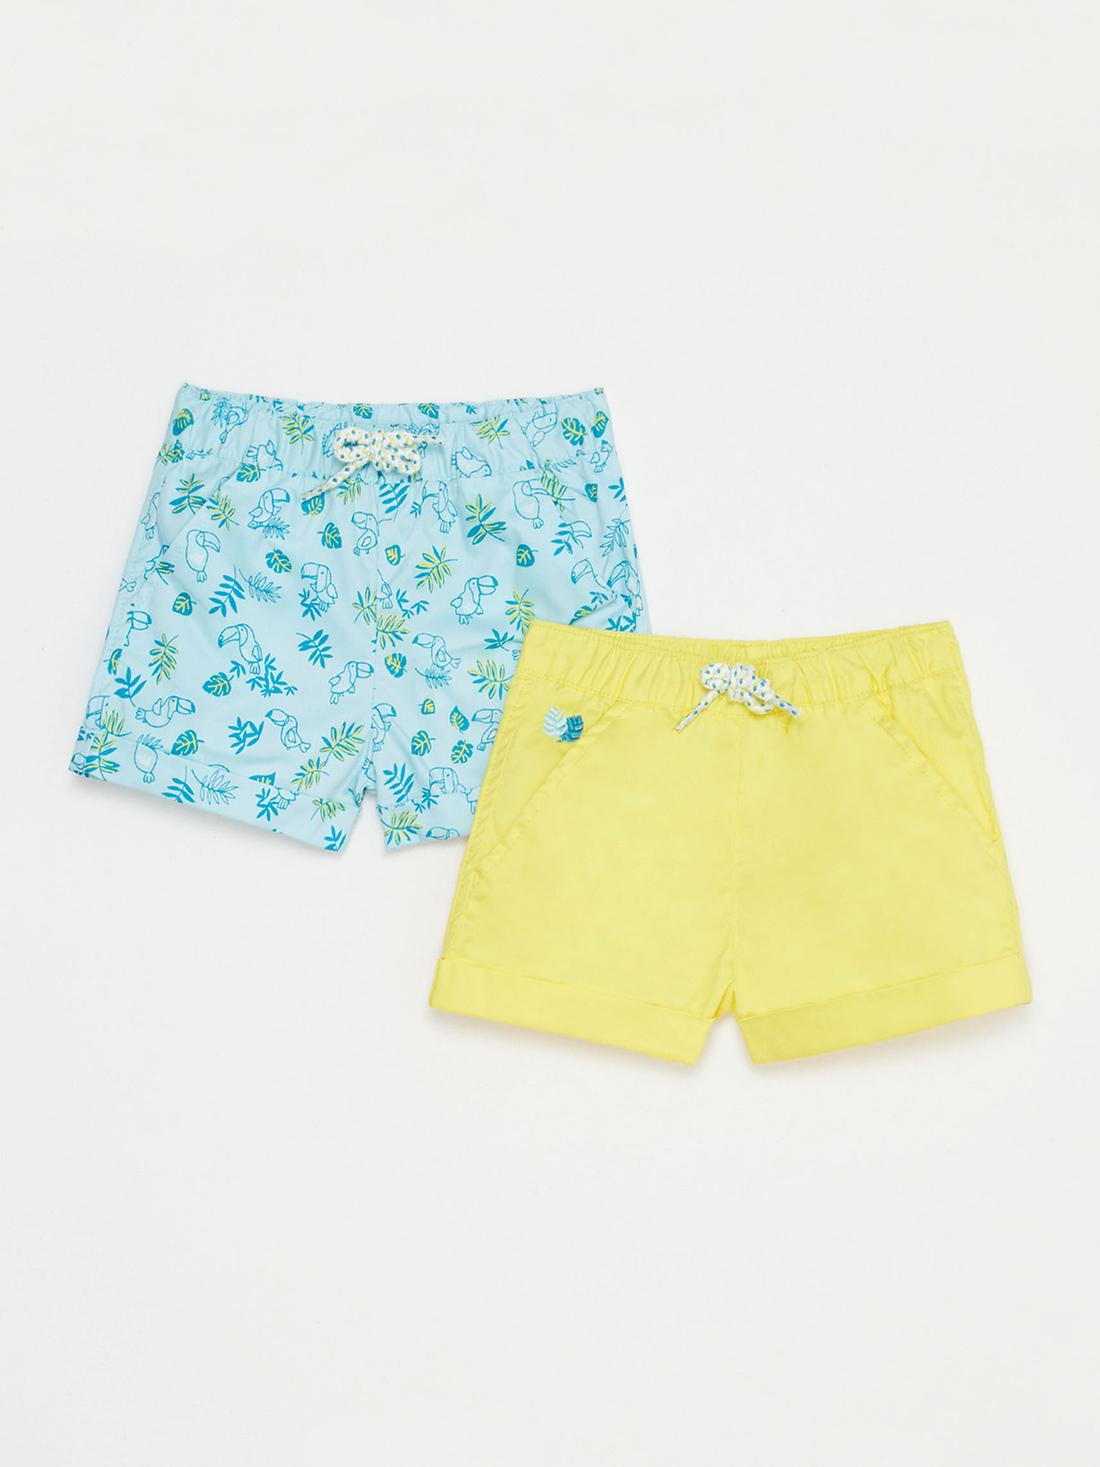 Lot de deux shorts bébé garçon